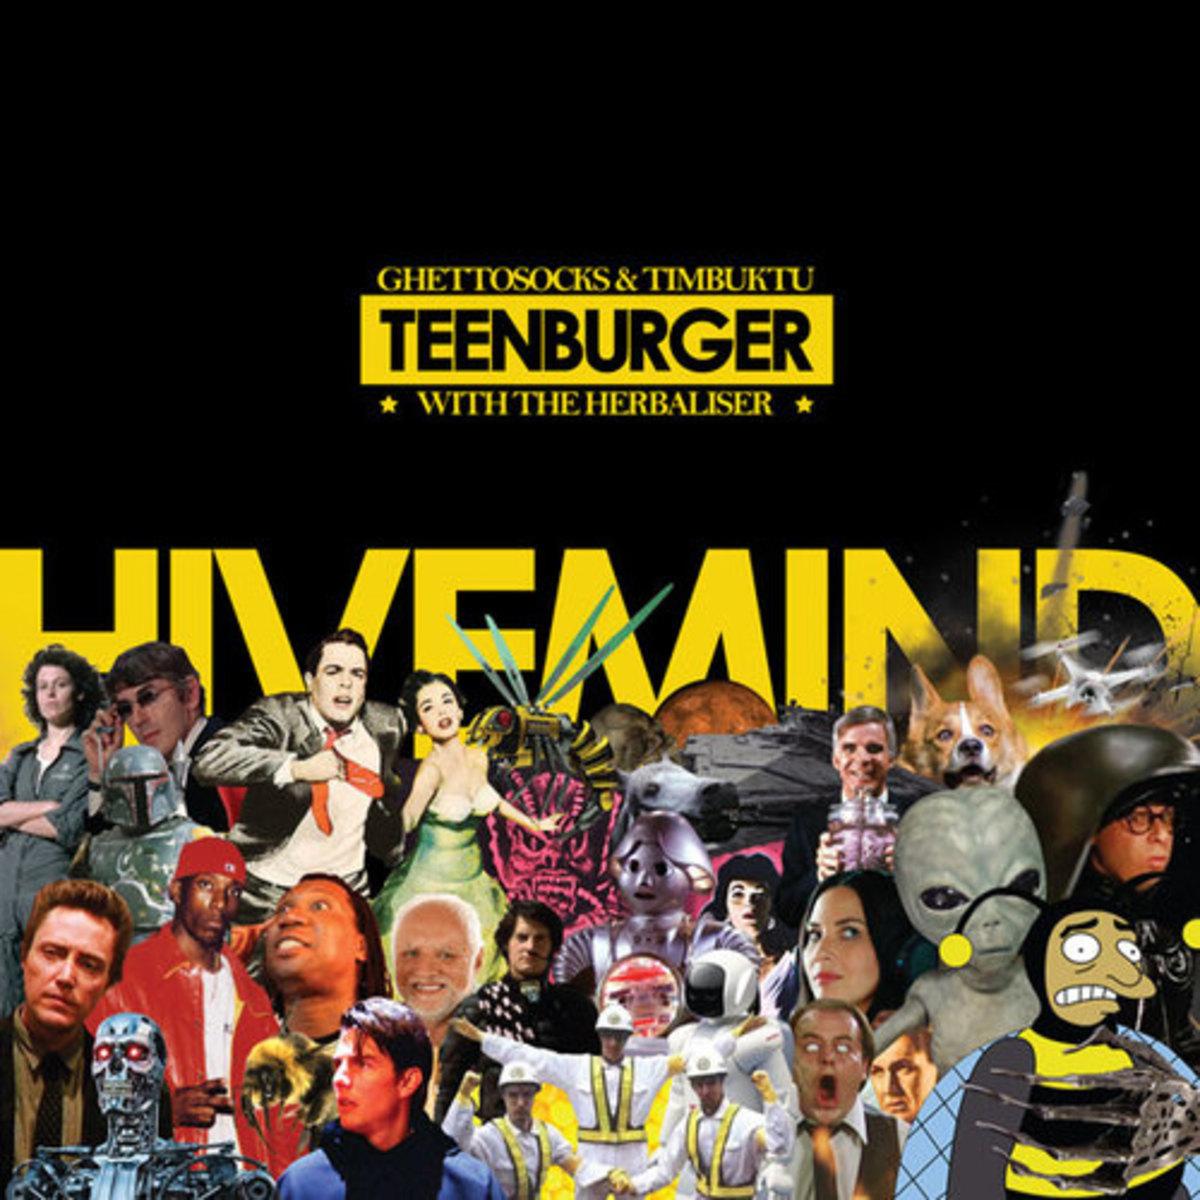 teenburger-hivemind.jpg